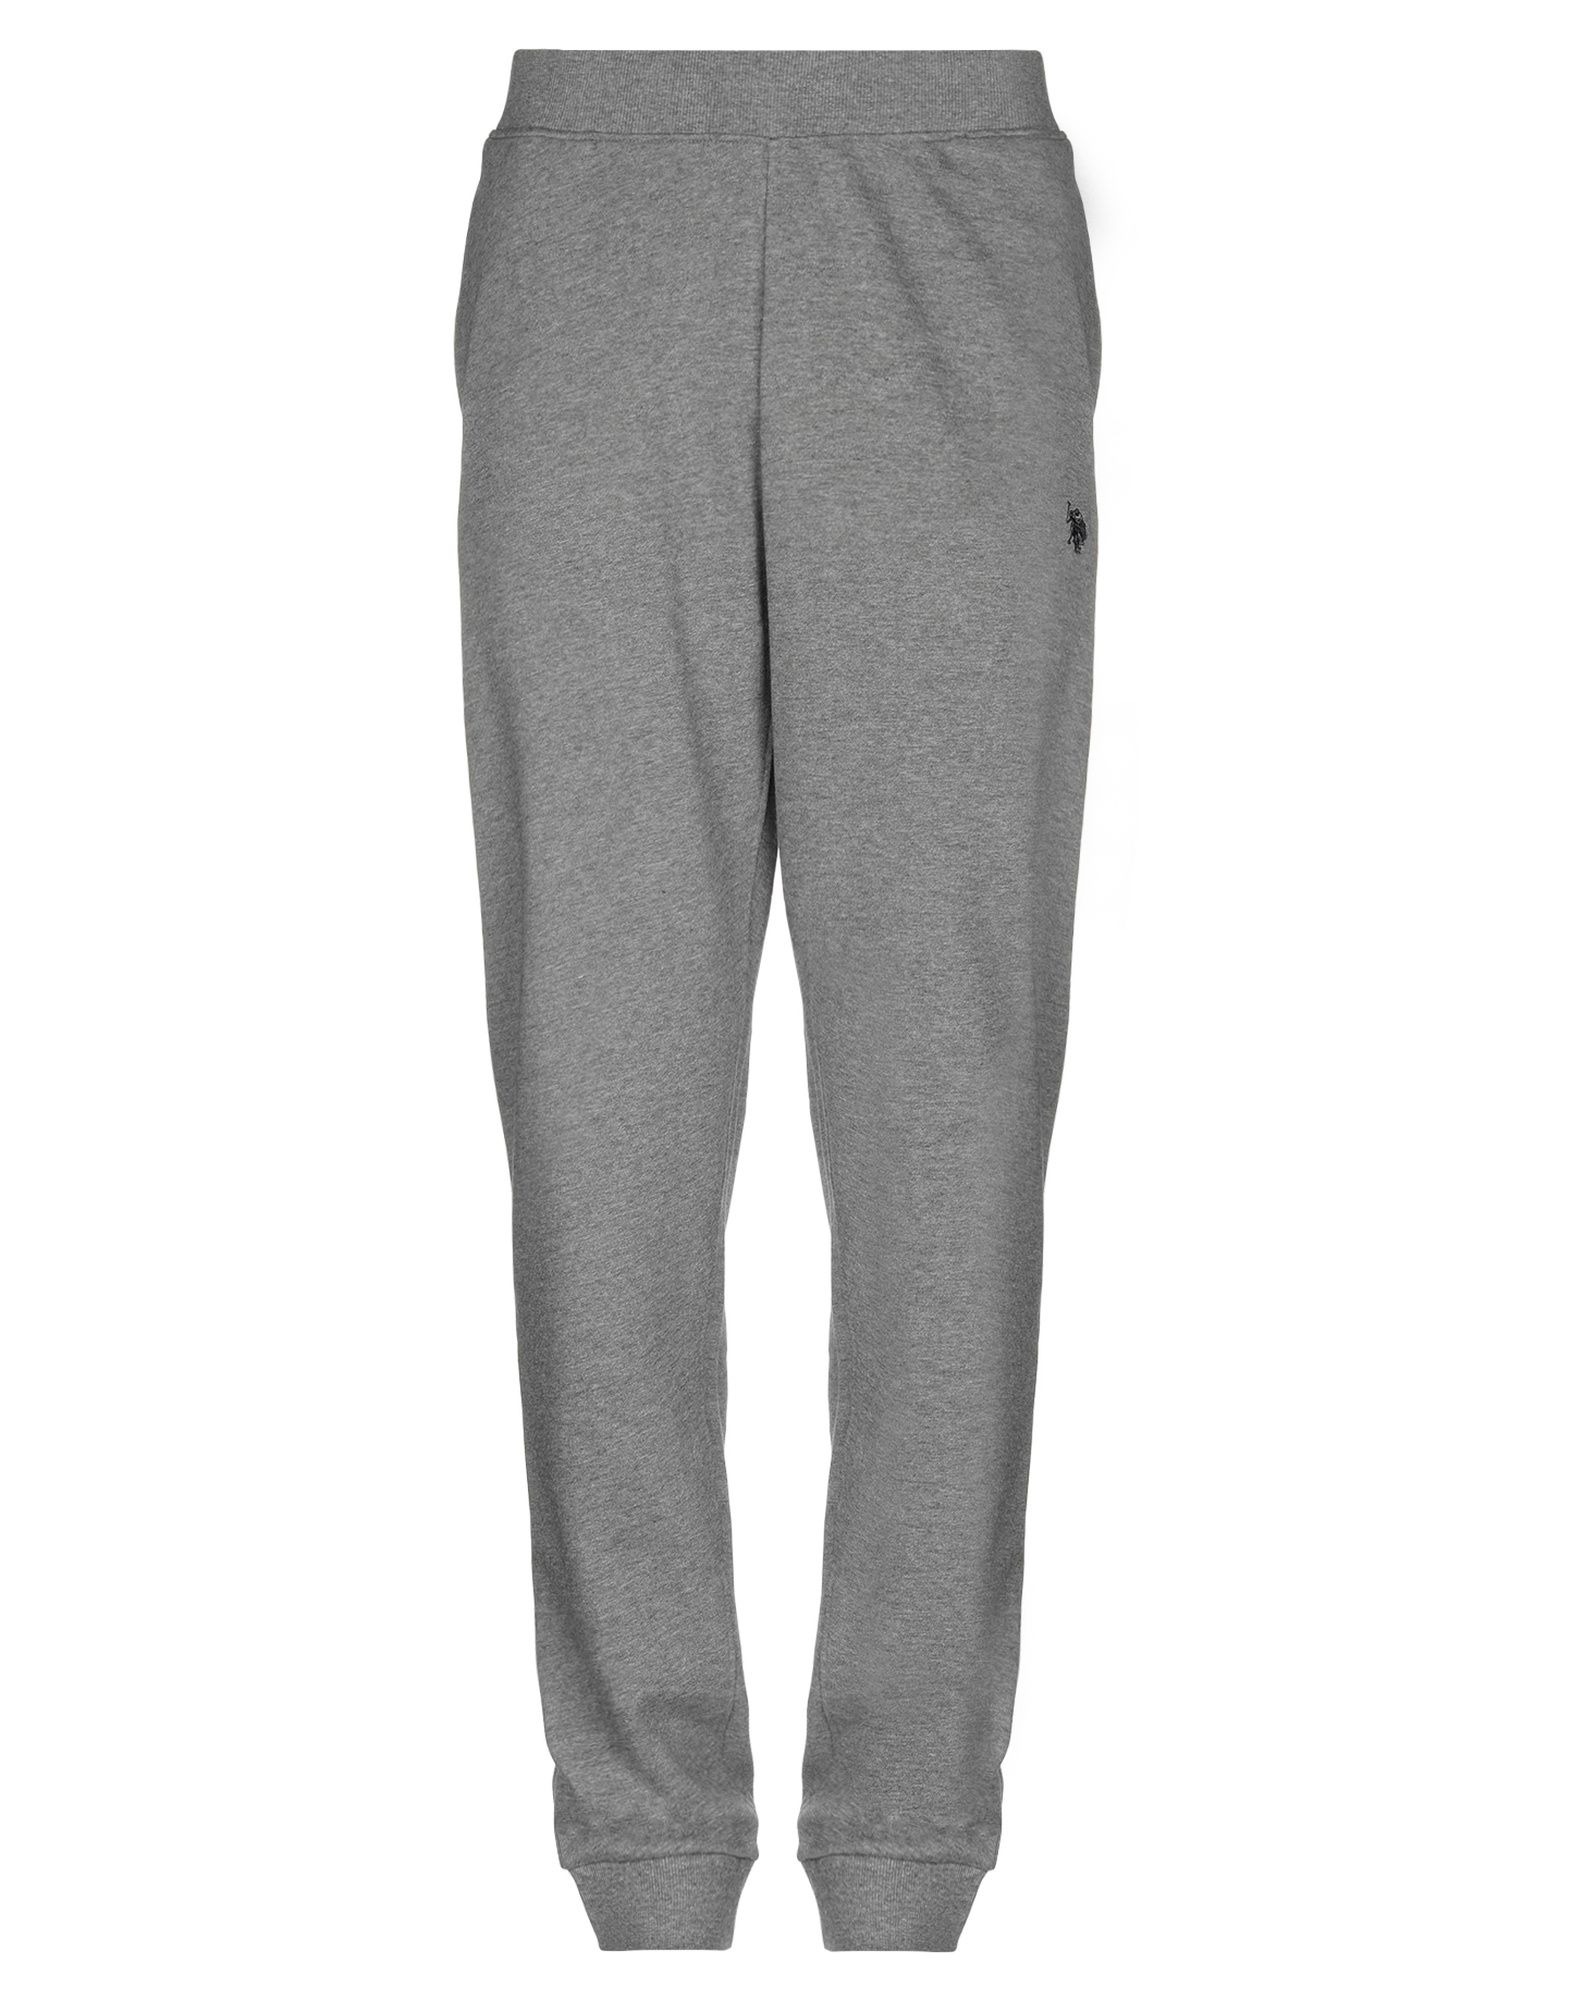 Pantalone U.S.Polo Assn. uomo - 13341828UK